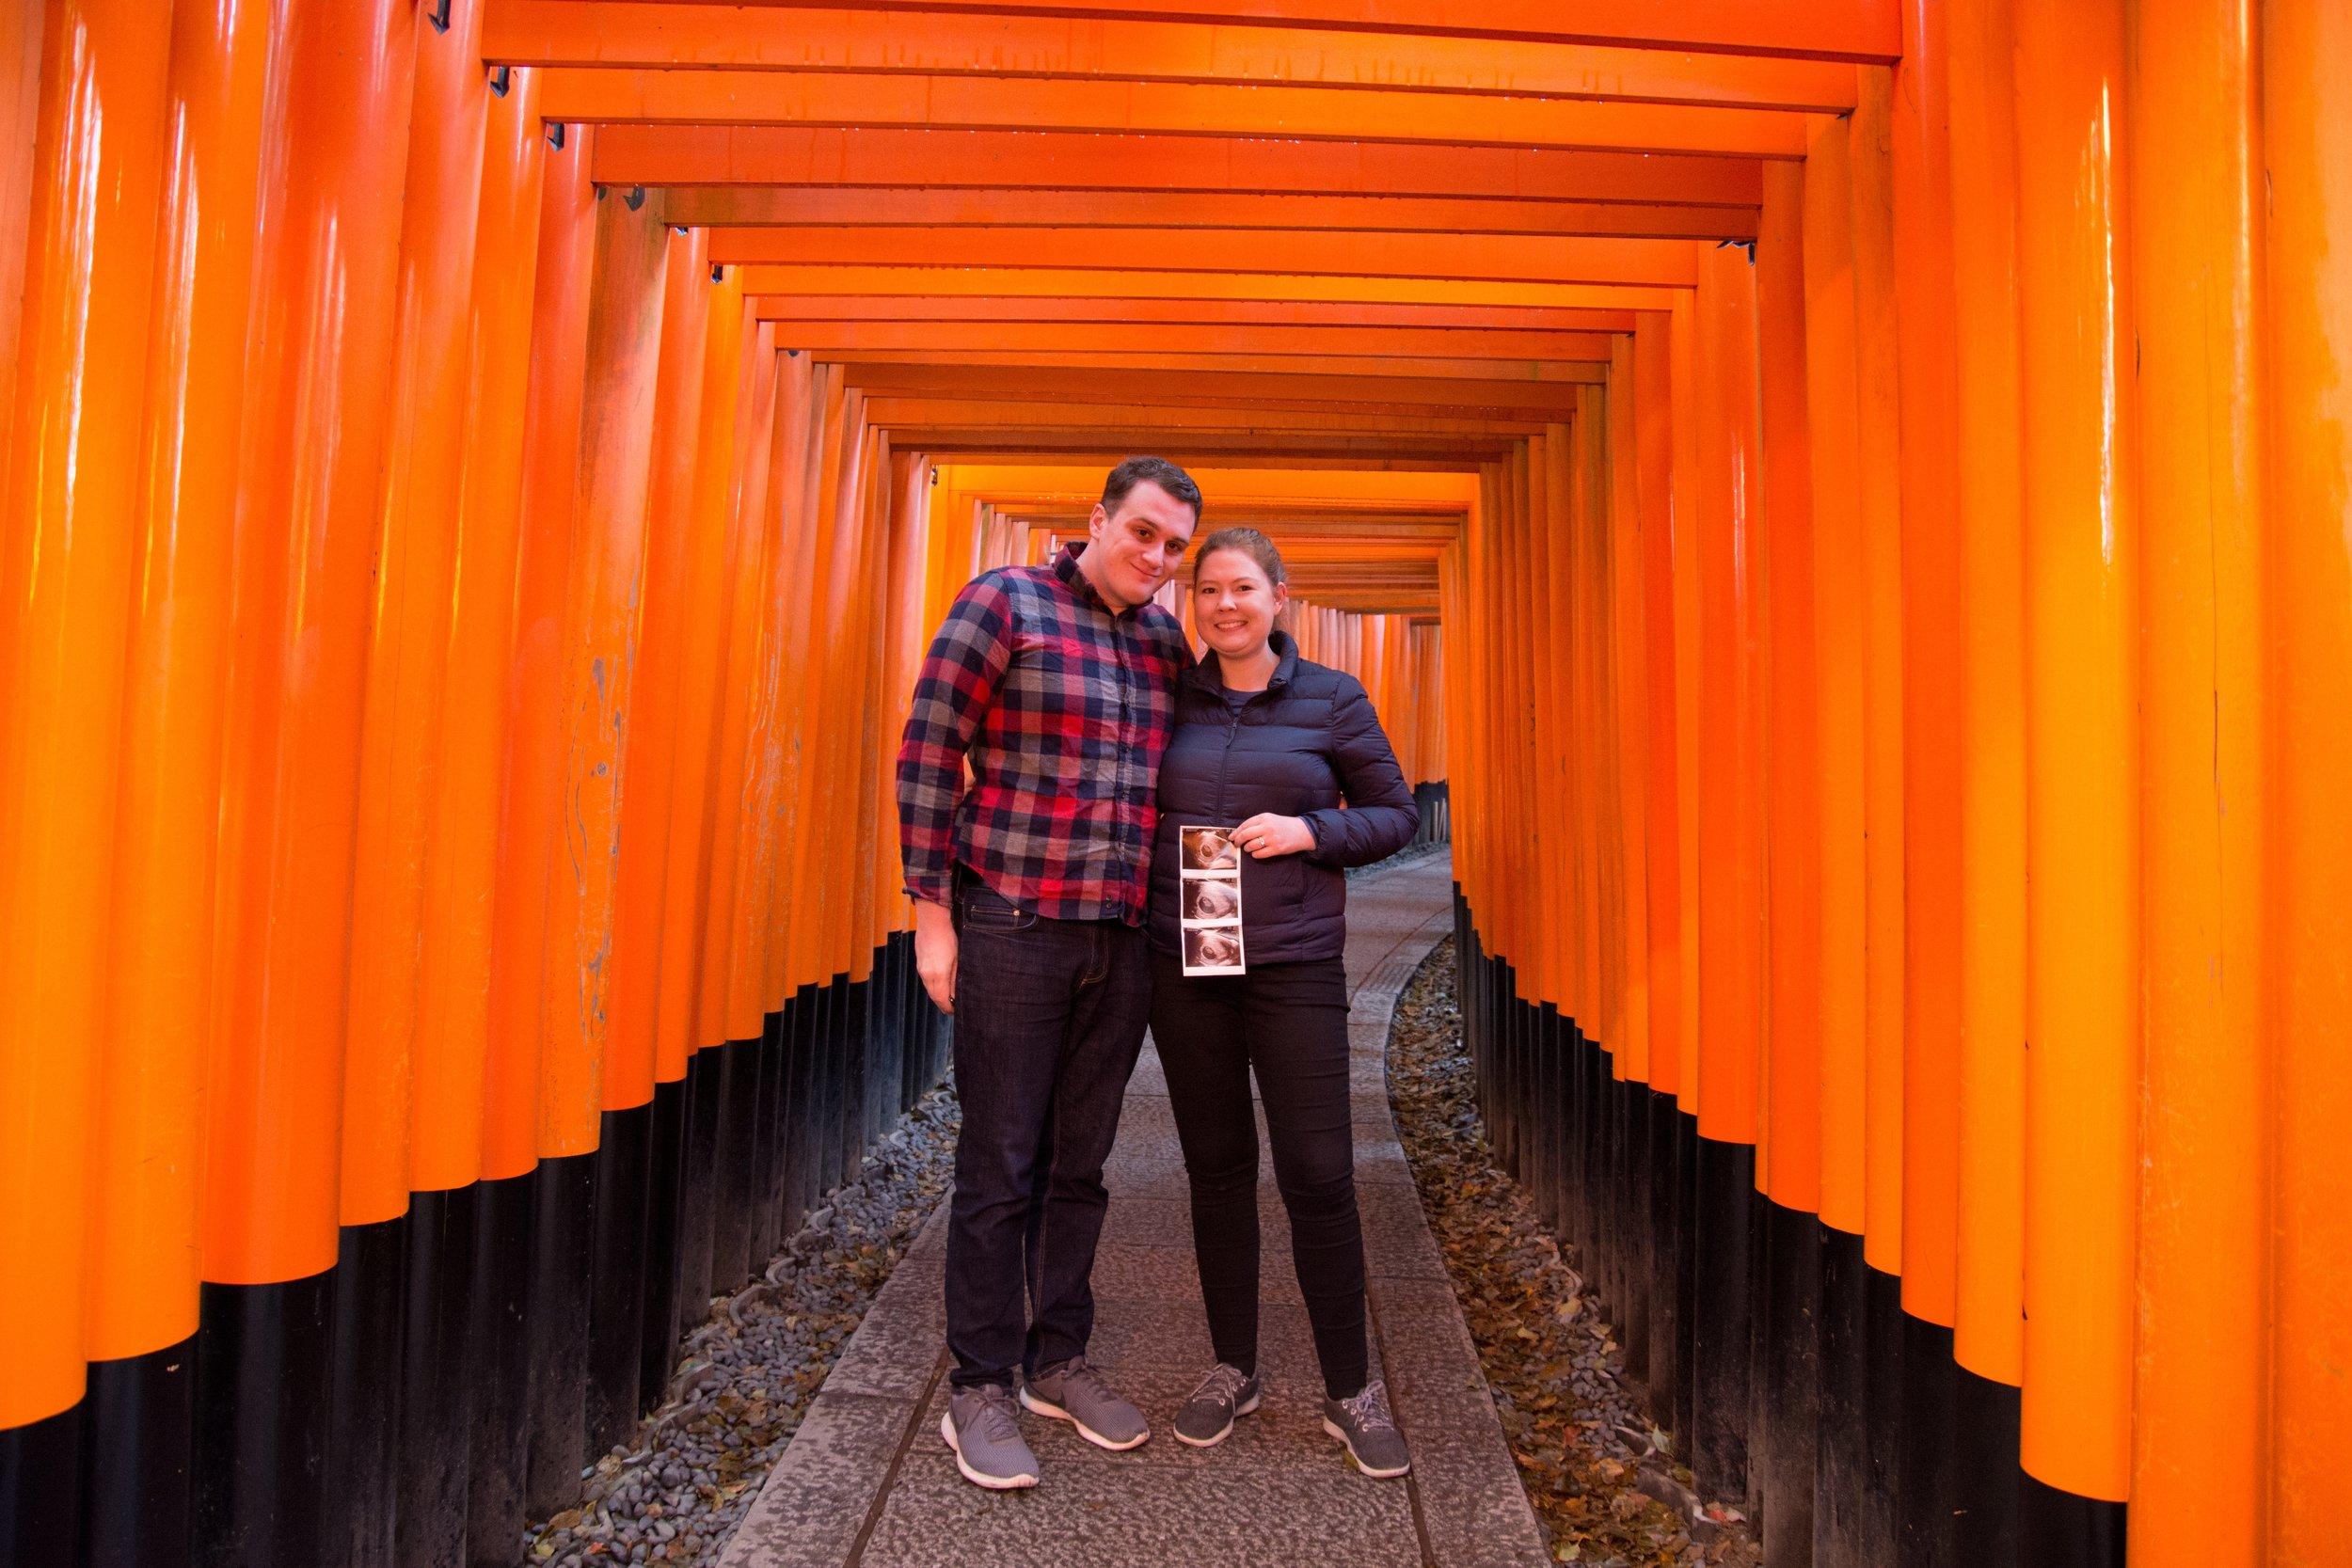 11 Weeks Pregnant at Fushimi Inari-taisha shrine in Kyoto, Japan